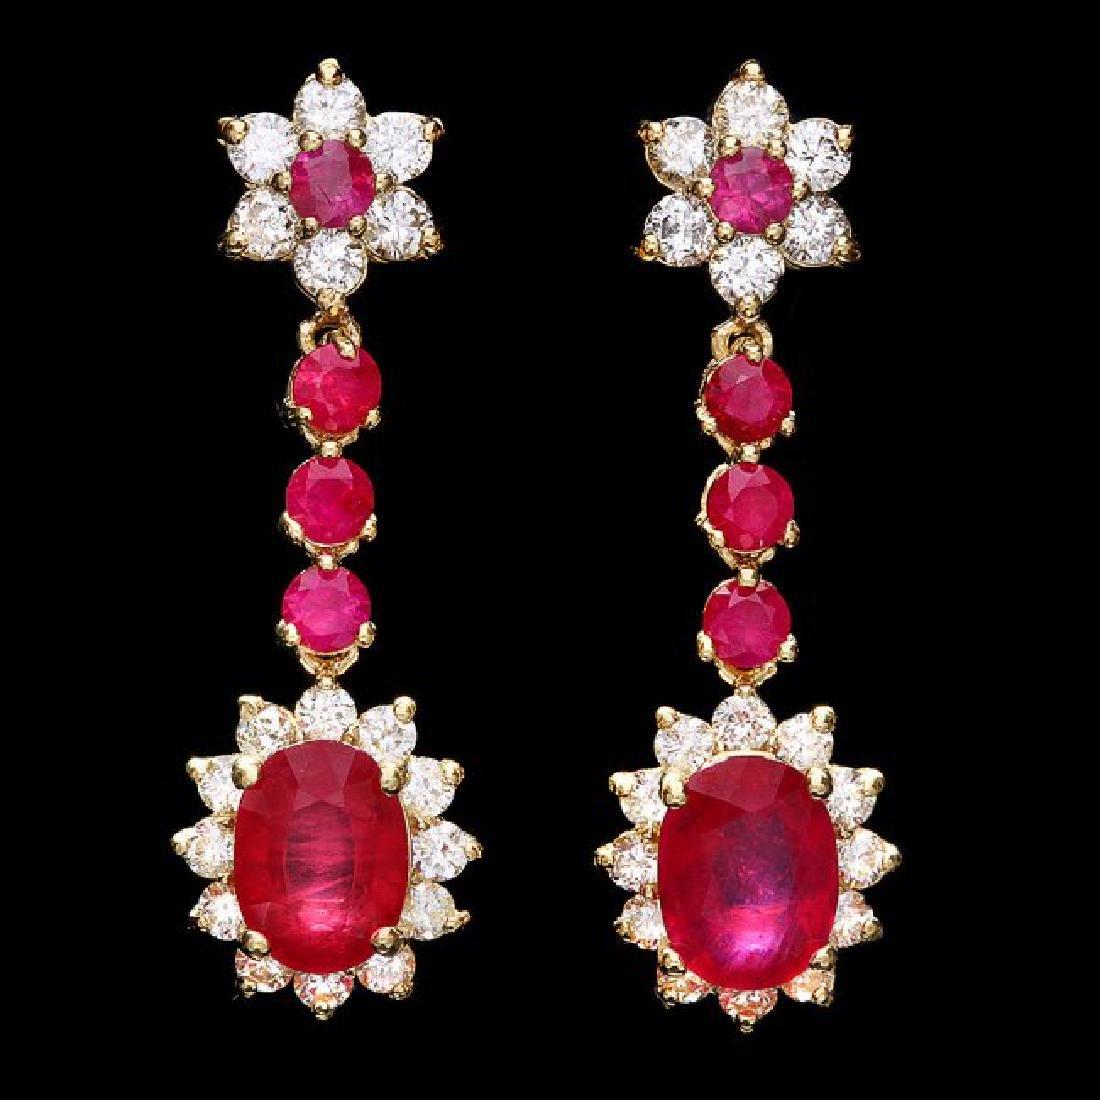 14k Yellow Gold 5ct Ruby 1.60ct Diamond Earrings